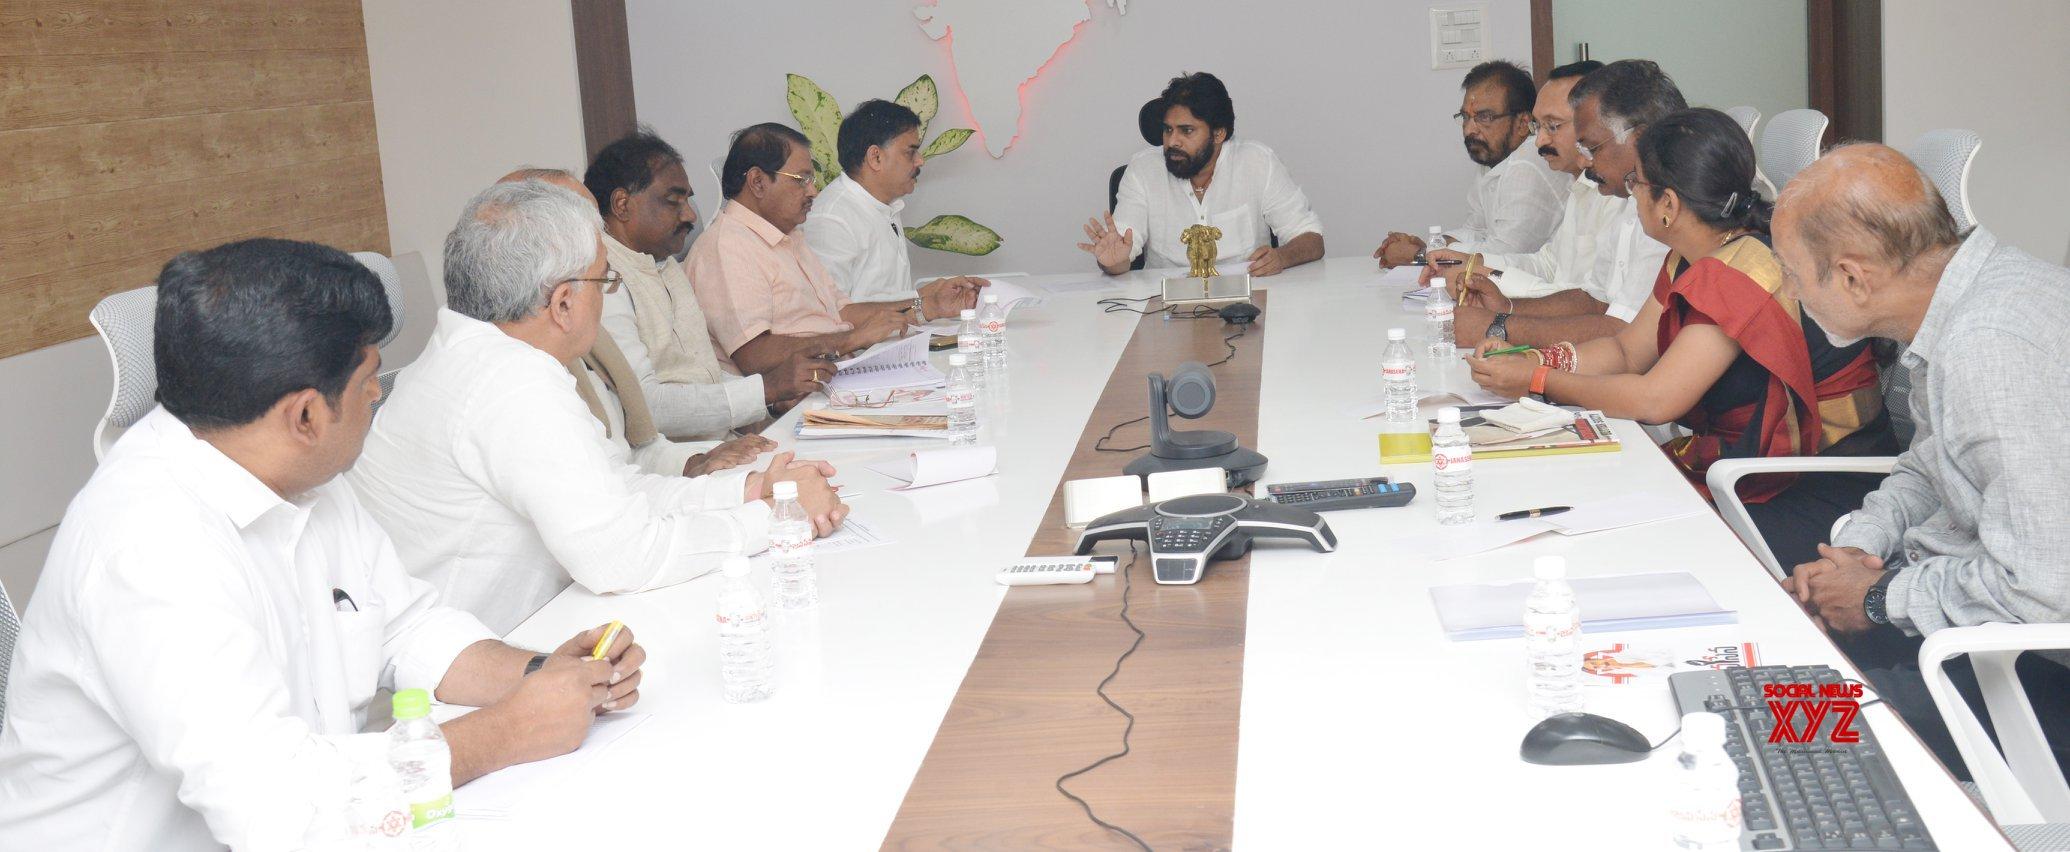 Janasena Chief Pawan Kalyan At Janasena PAC Meeting In Vijayawada - Gallery